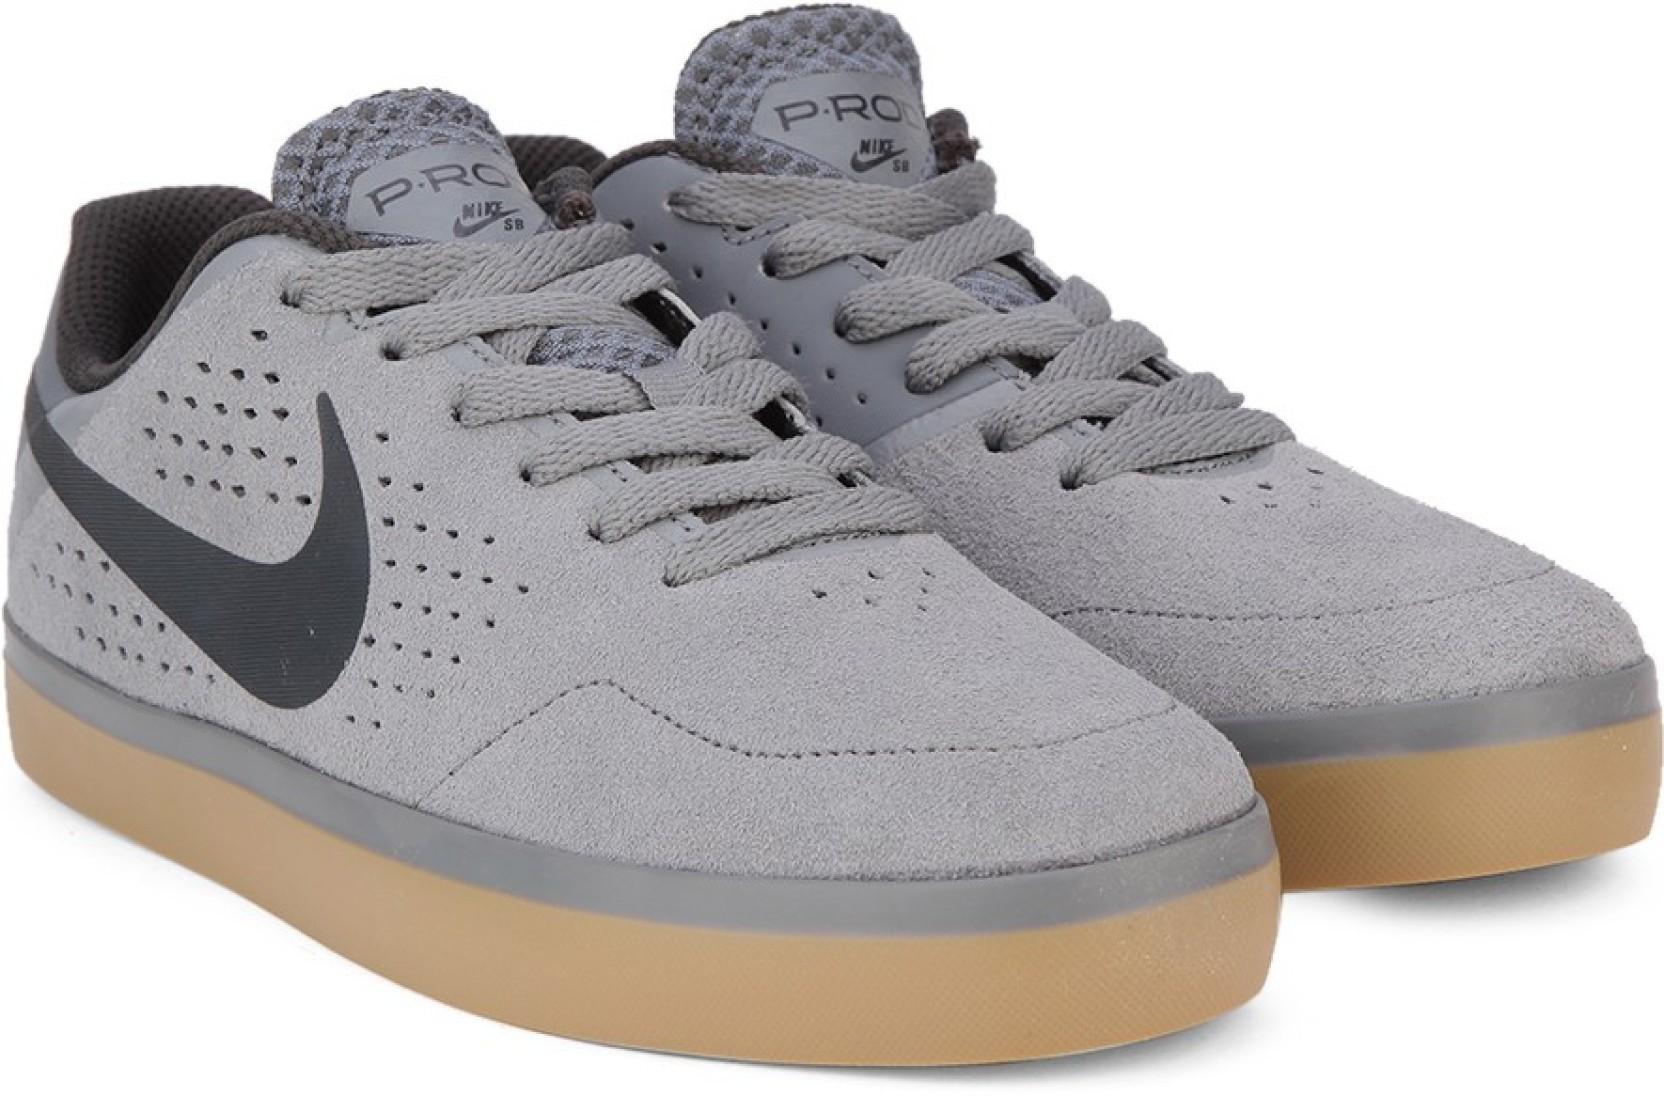 e18e901dadcfe9 ... nike sb paul rodriguez ctd lr sneakers for men (grey black)